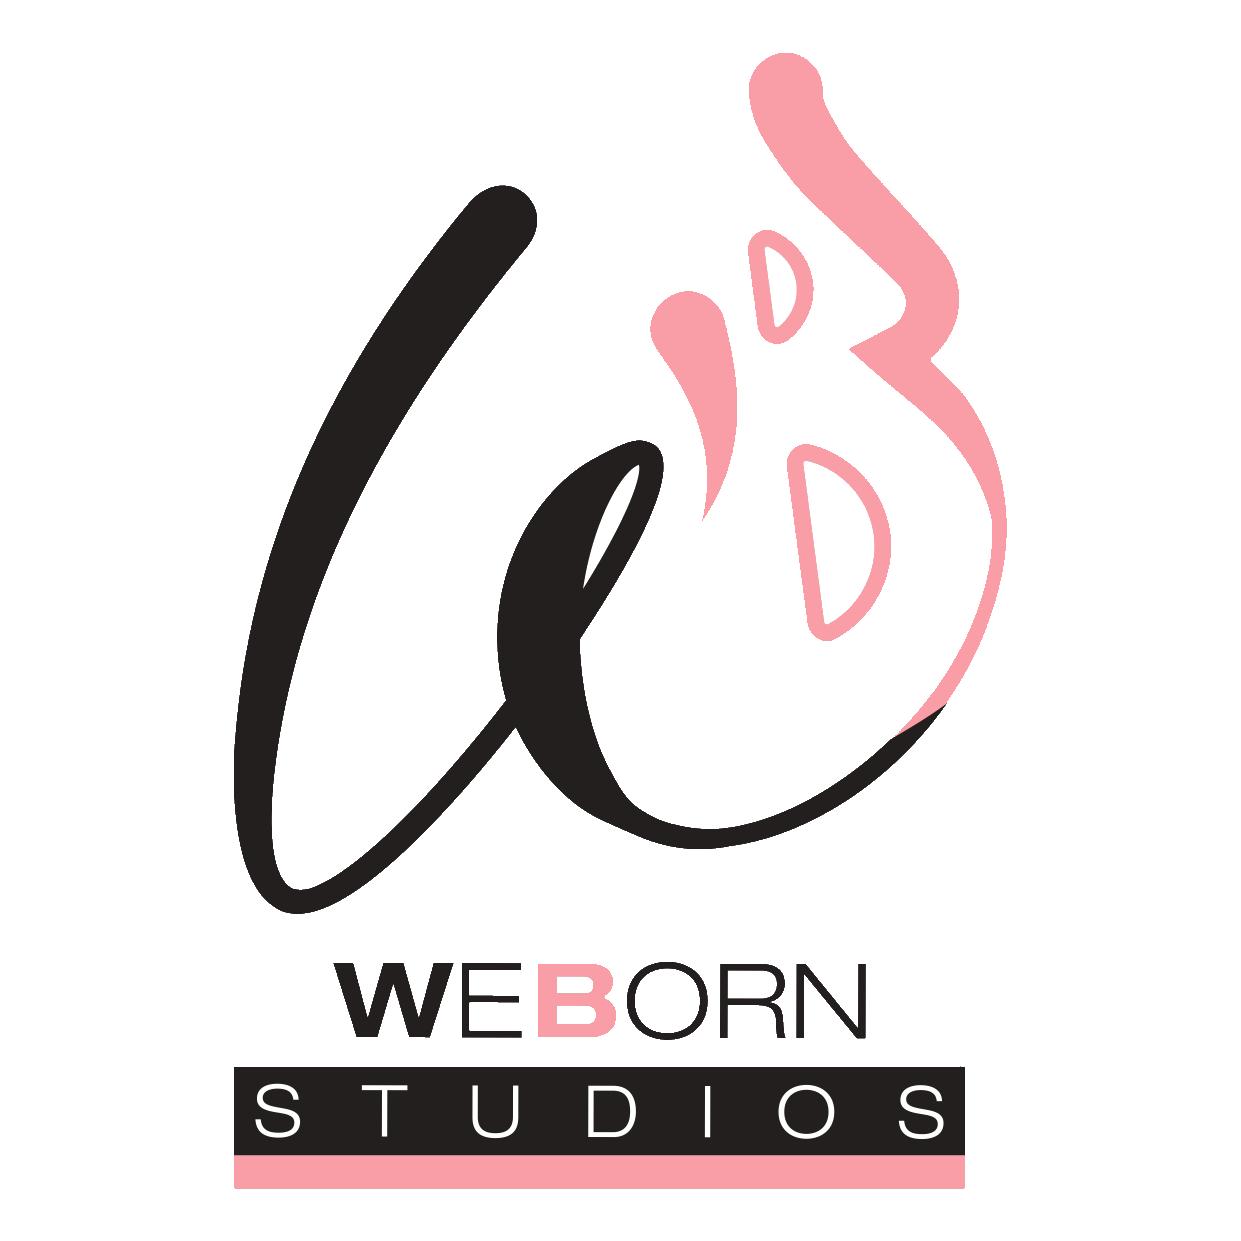 WeBorn Studios - Maternity and Newborn photography